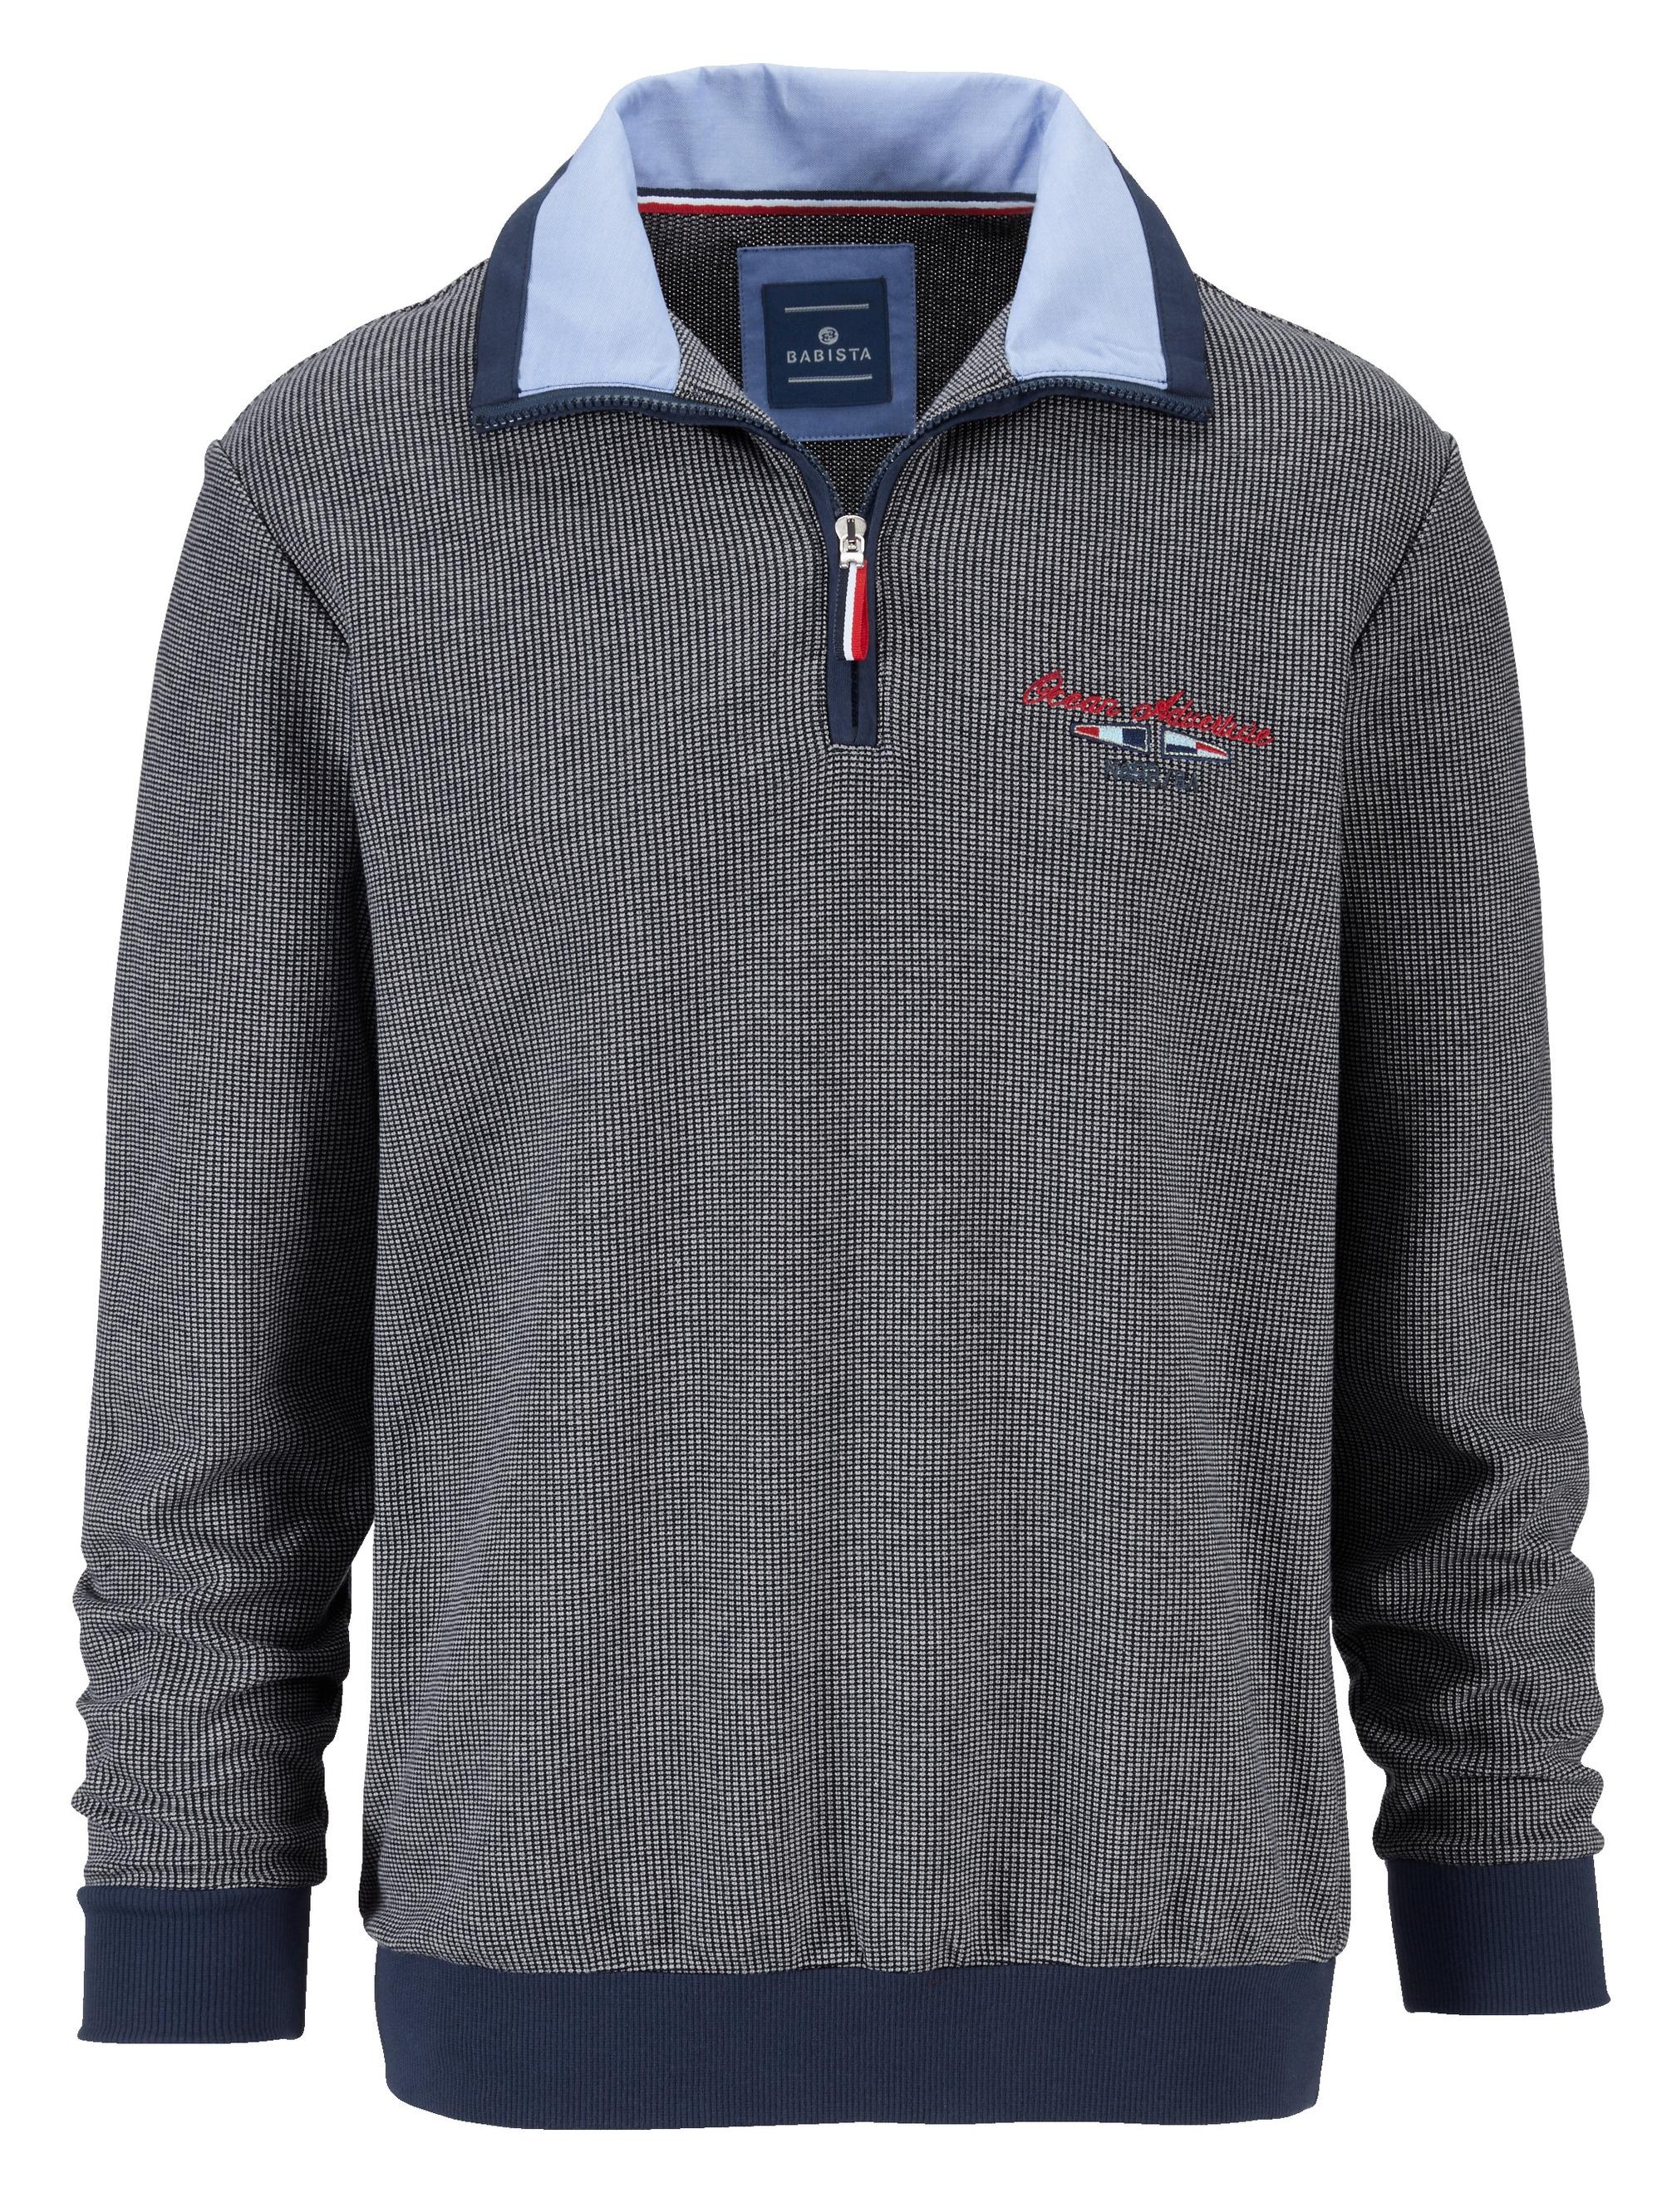 Babista Sweatshirt in zweifarbiger Reiskorn-Optik Herrenmode/Bekleidung/Sweatshirts & -jacken/Sweatshirts